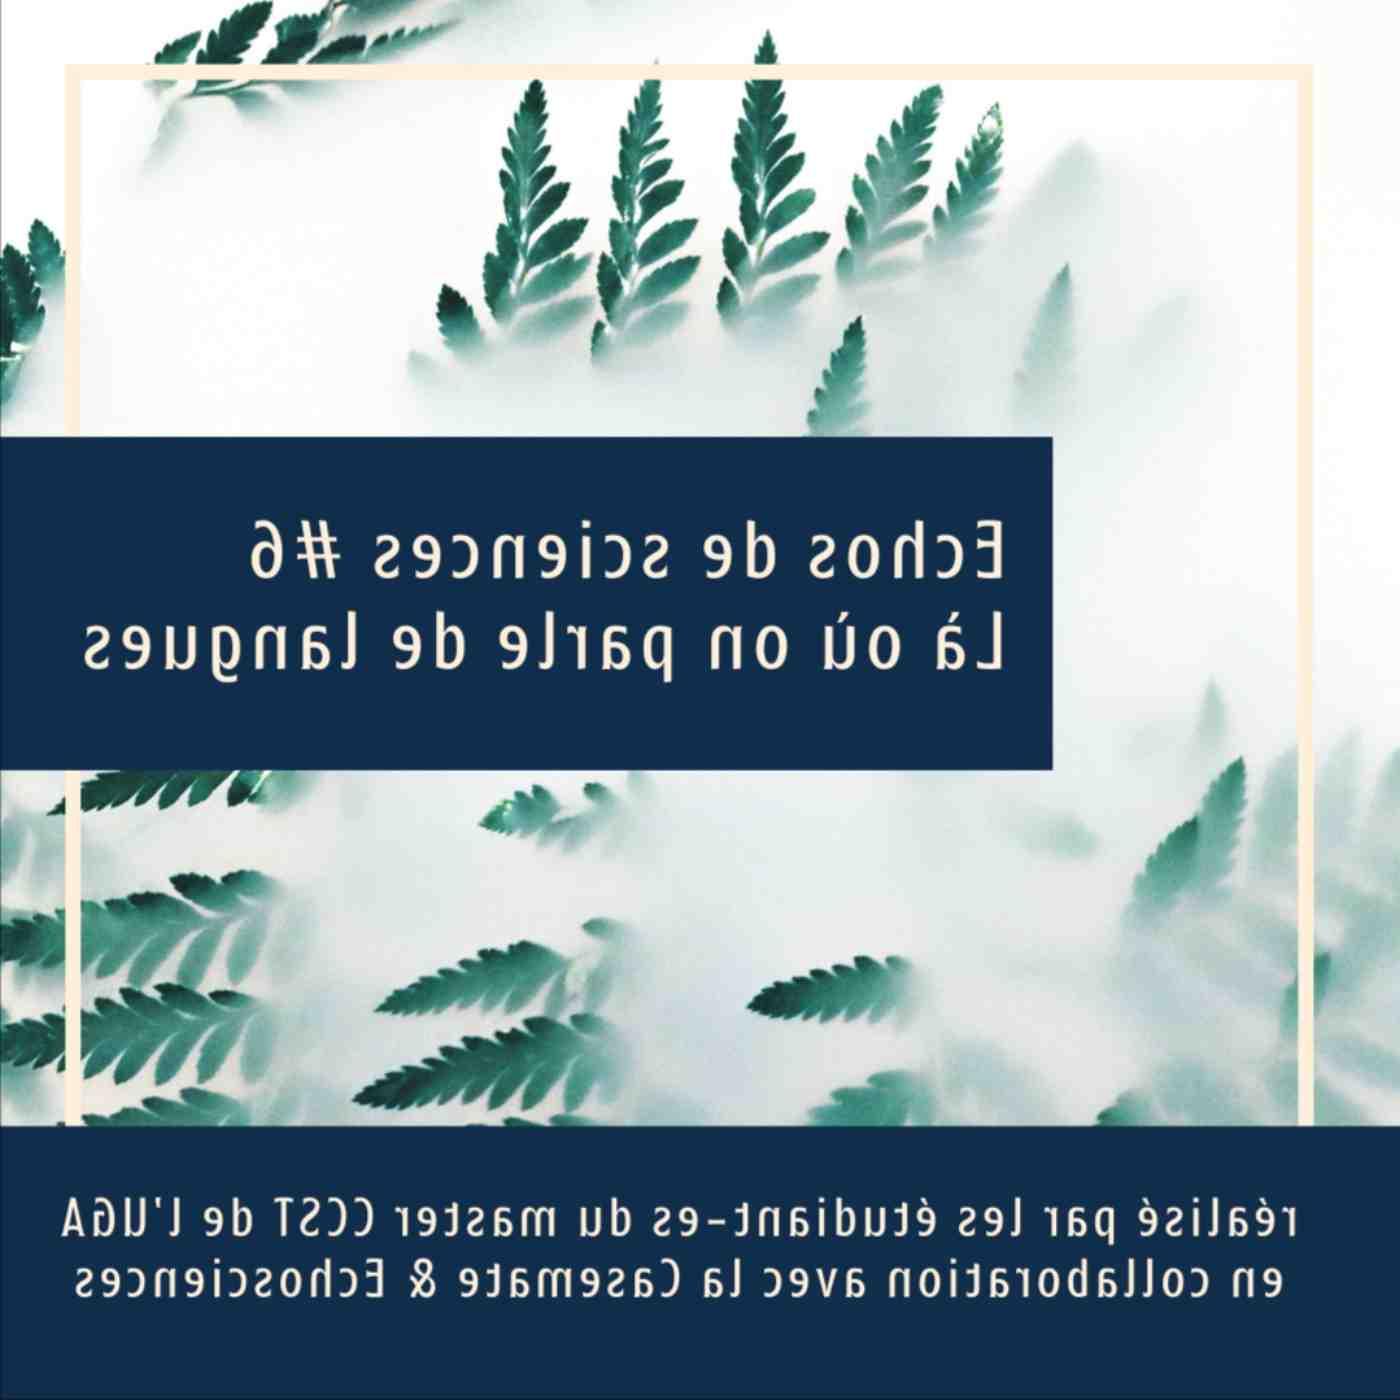 Covid-19: la recherche dans l'urgence [27:43] – [34.02]